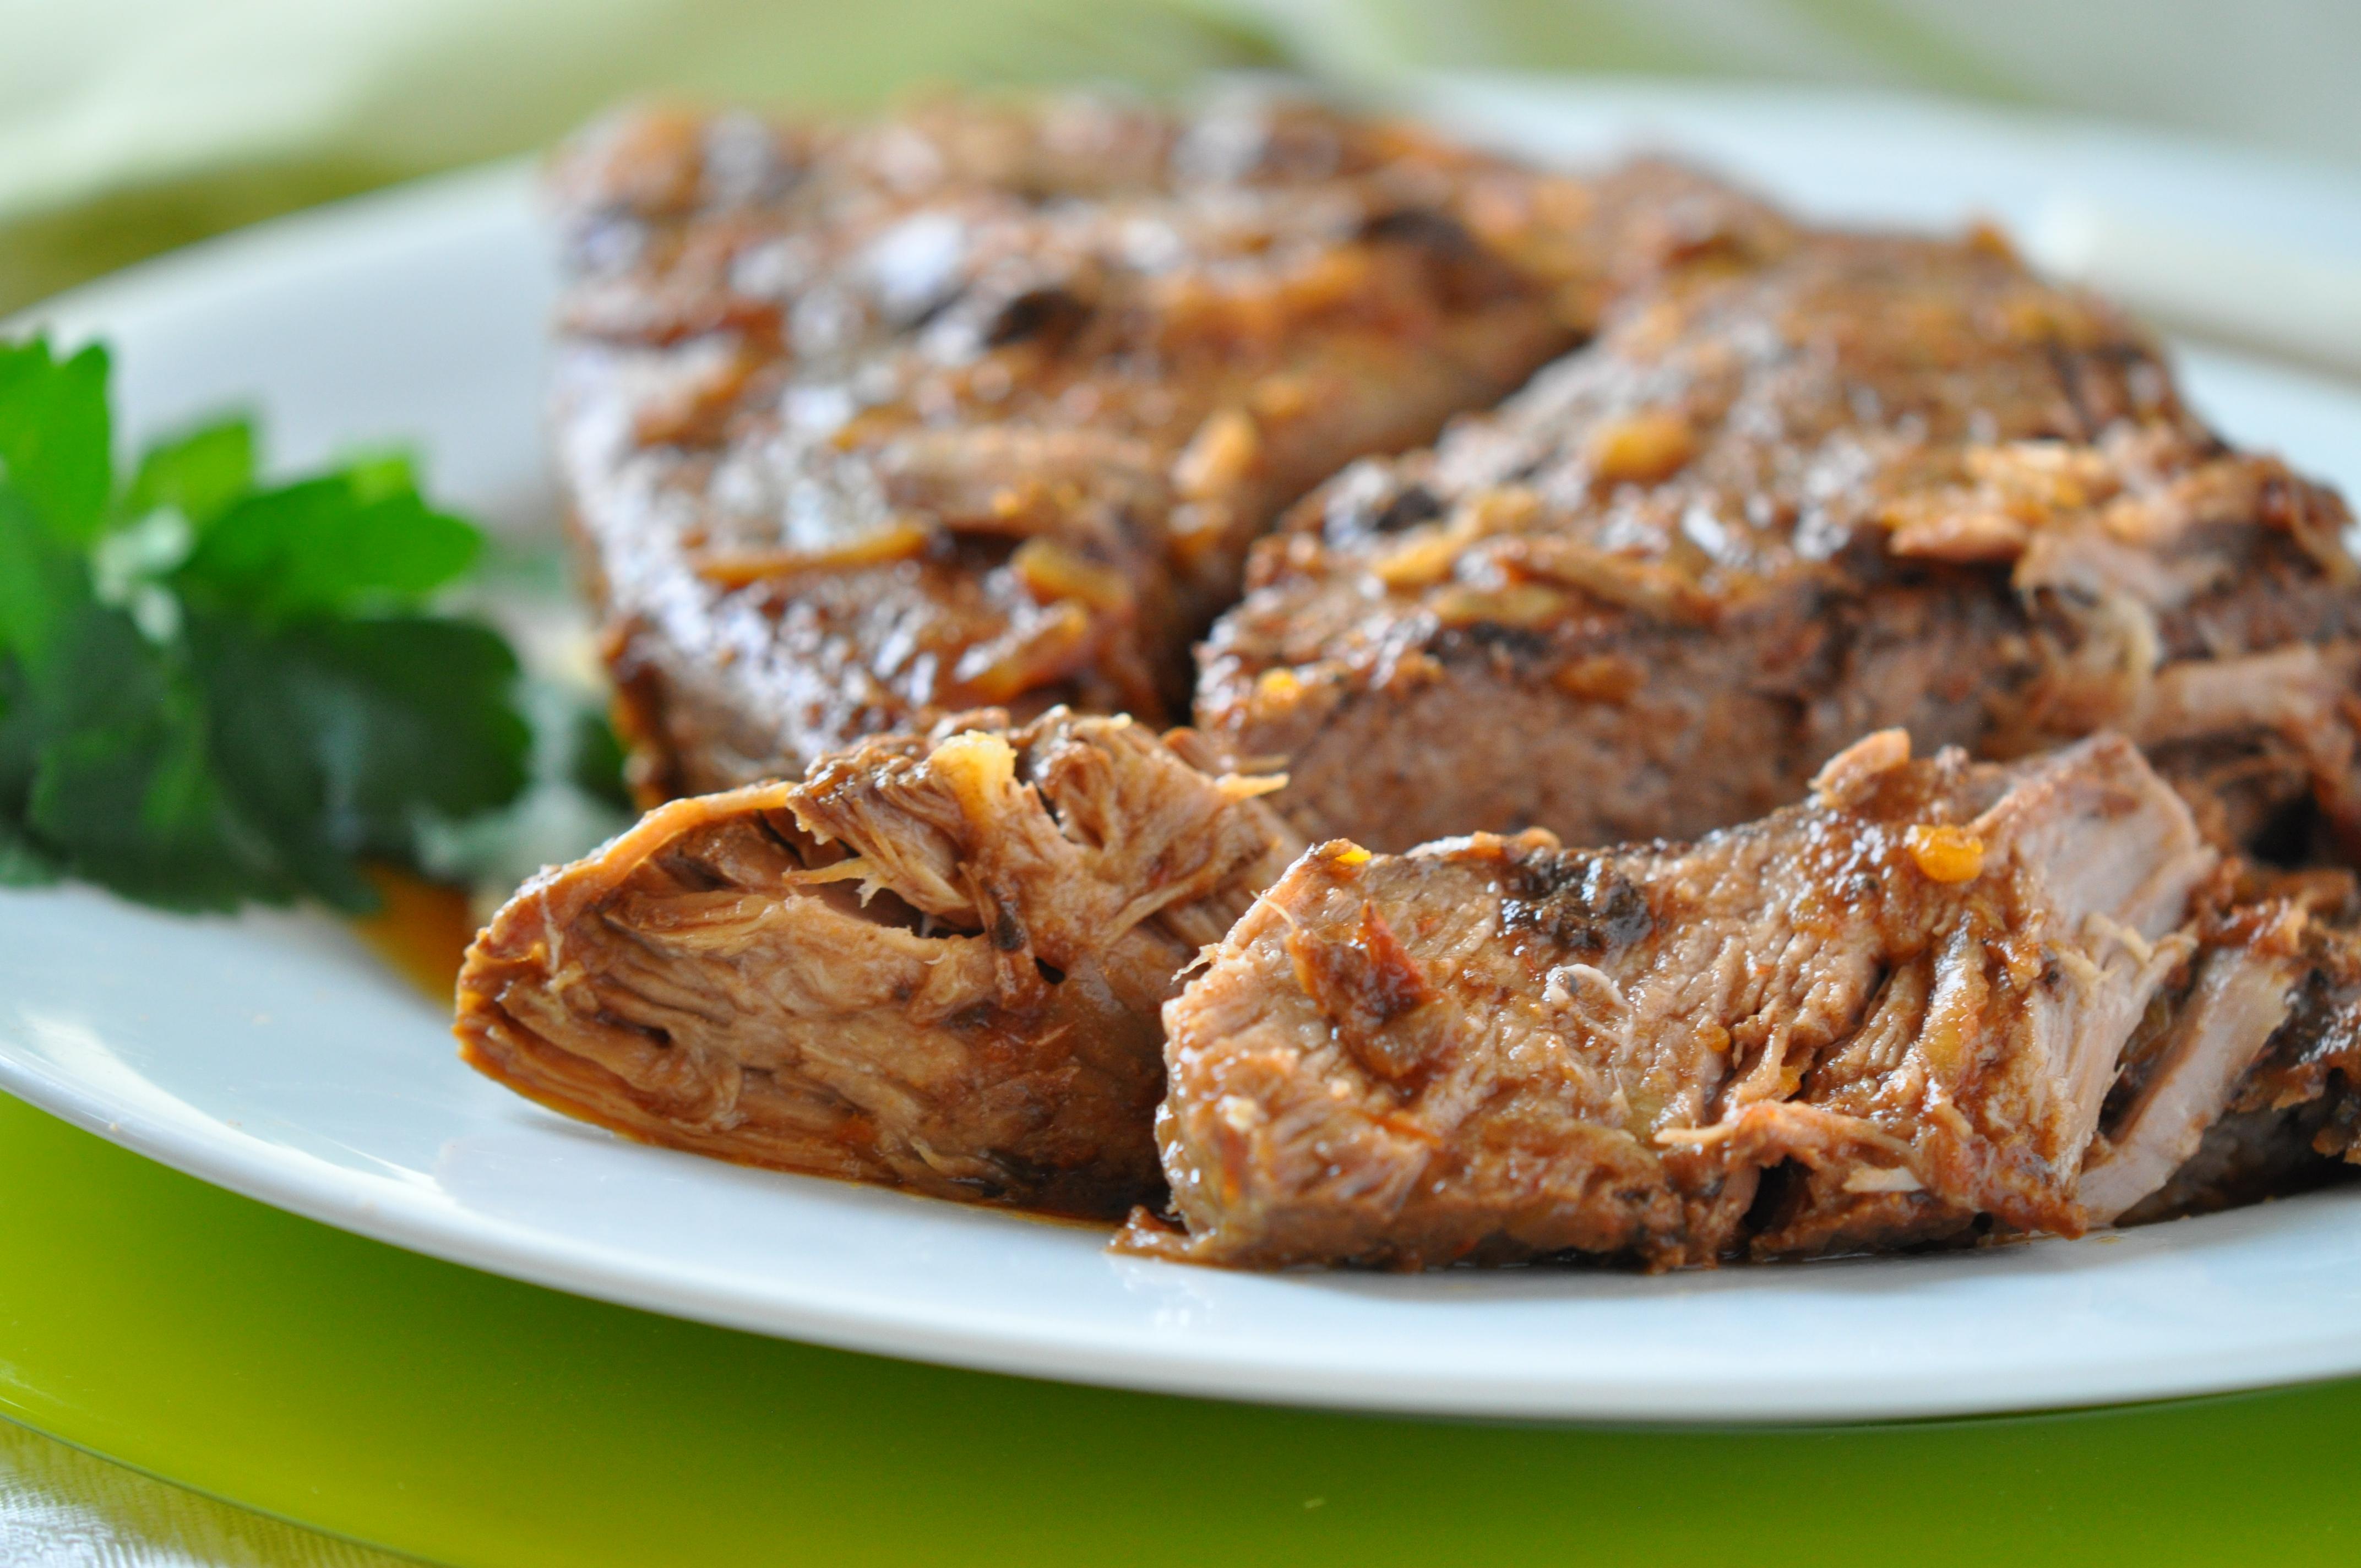 Beef Brisket/Beef Sliders - Speaking of Women's Health